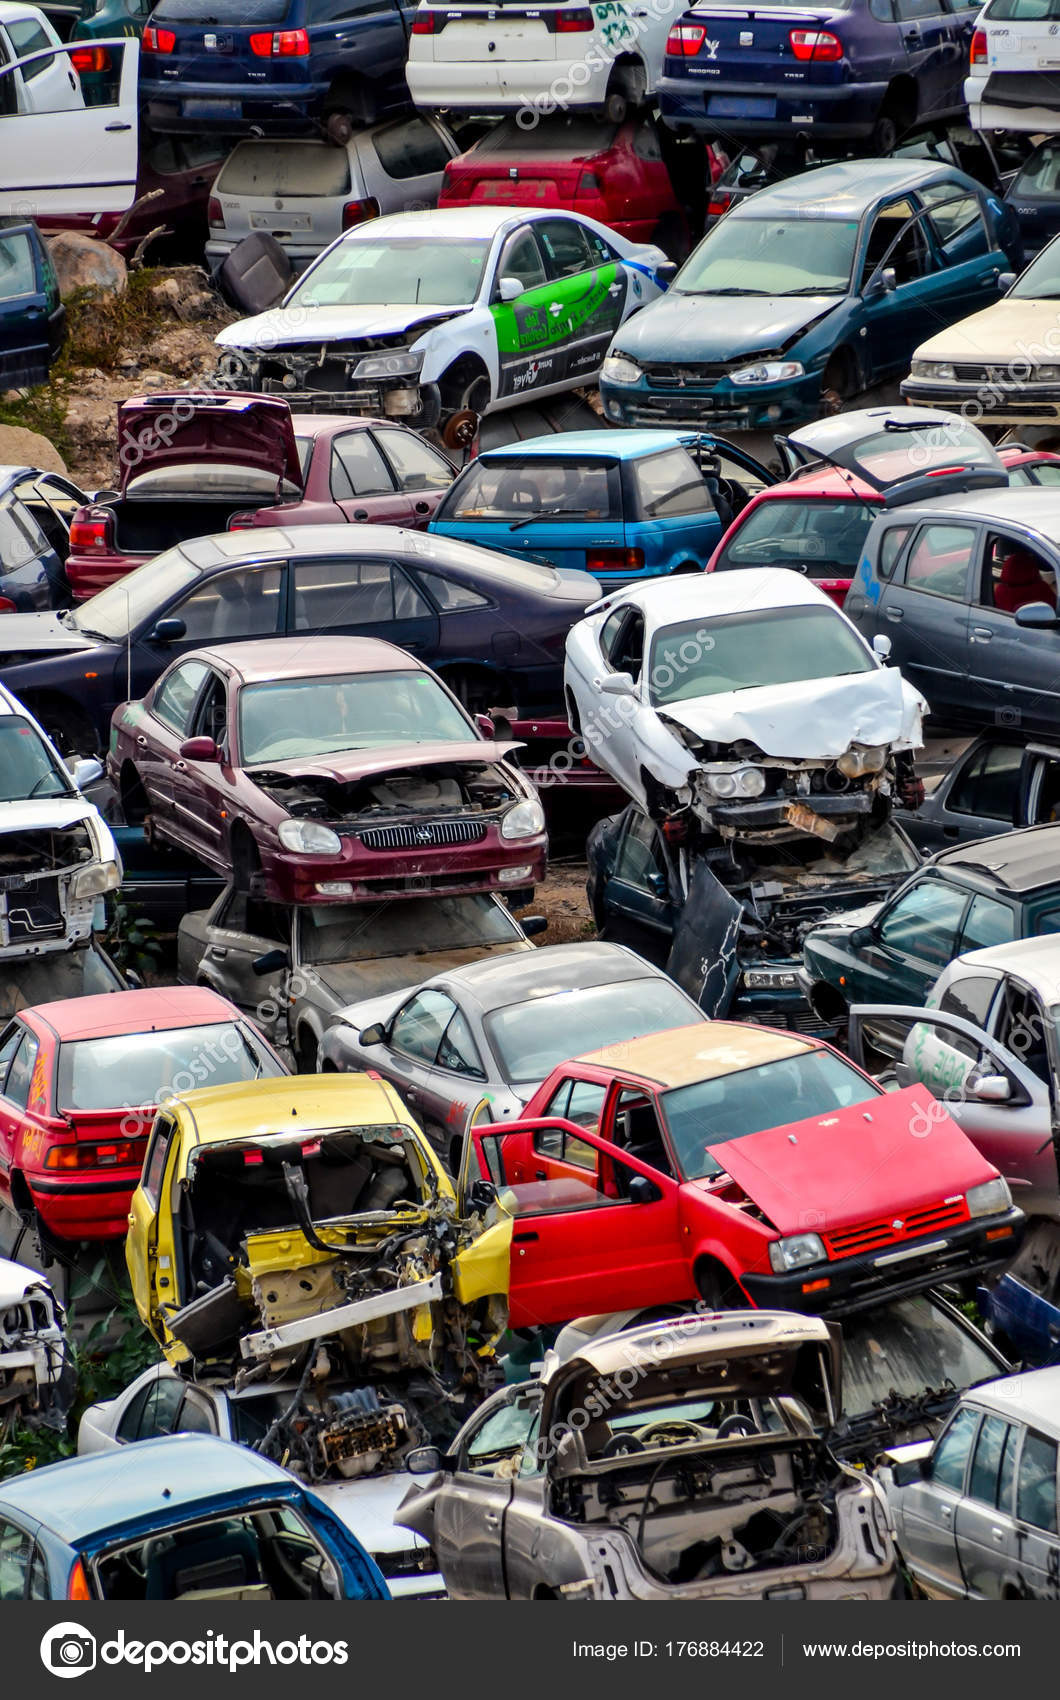 Old Junk Cars On Junkyard – Stock Editorial Photo © underworld1 ...